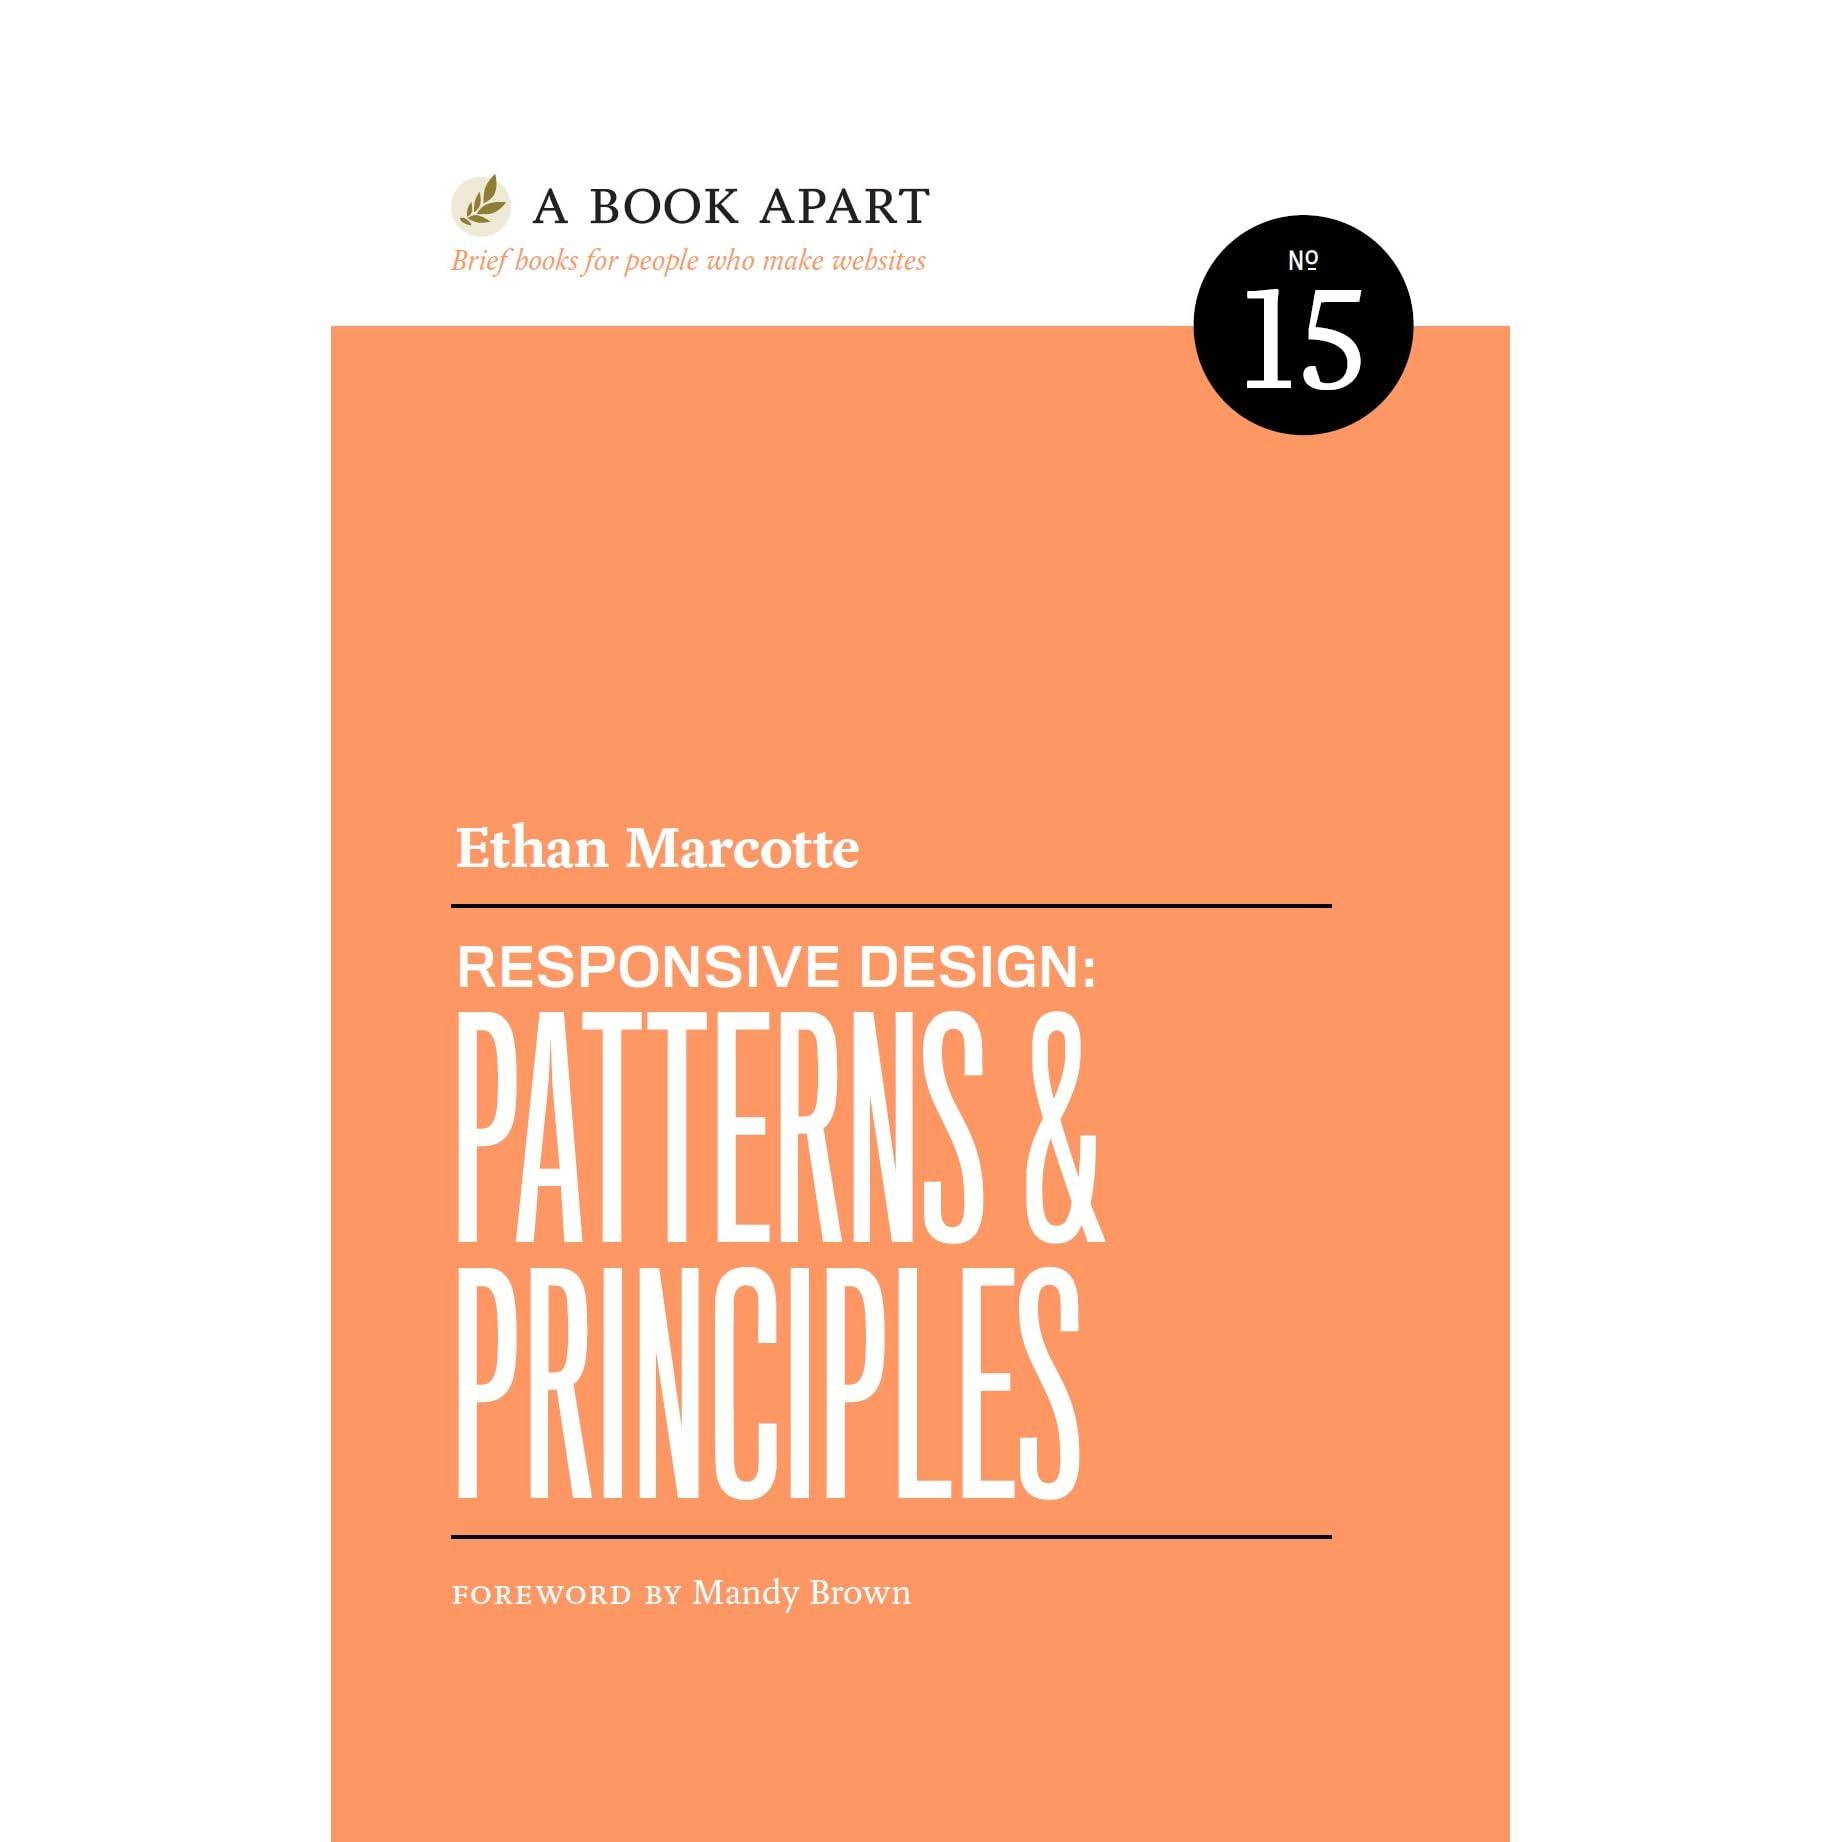 Responsive Design Patterns And Principles